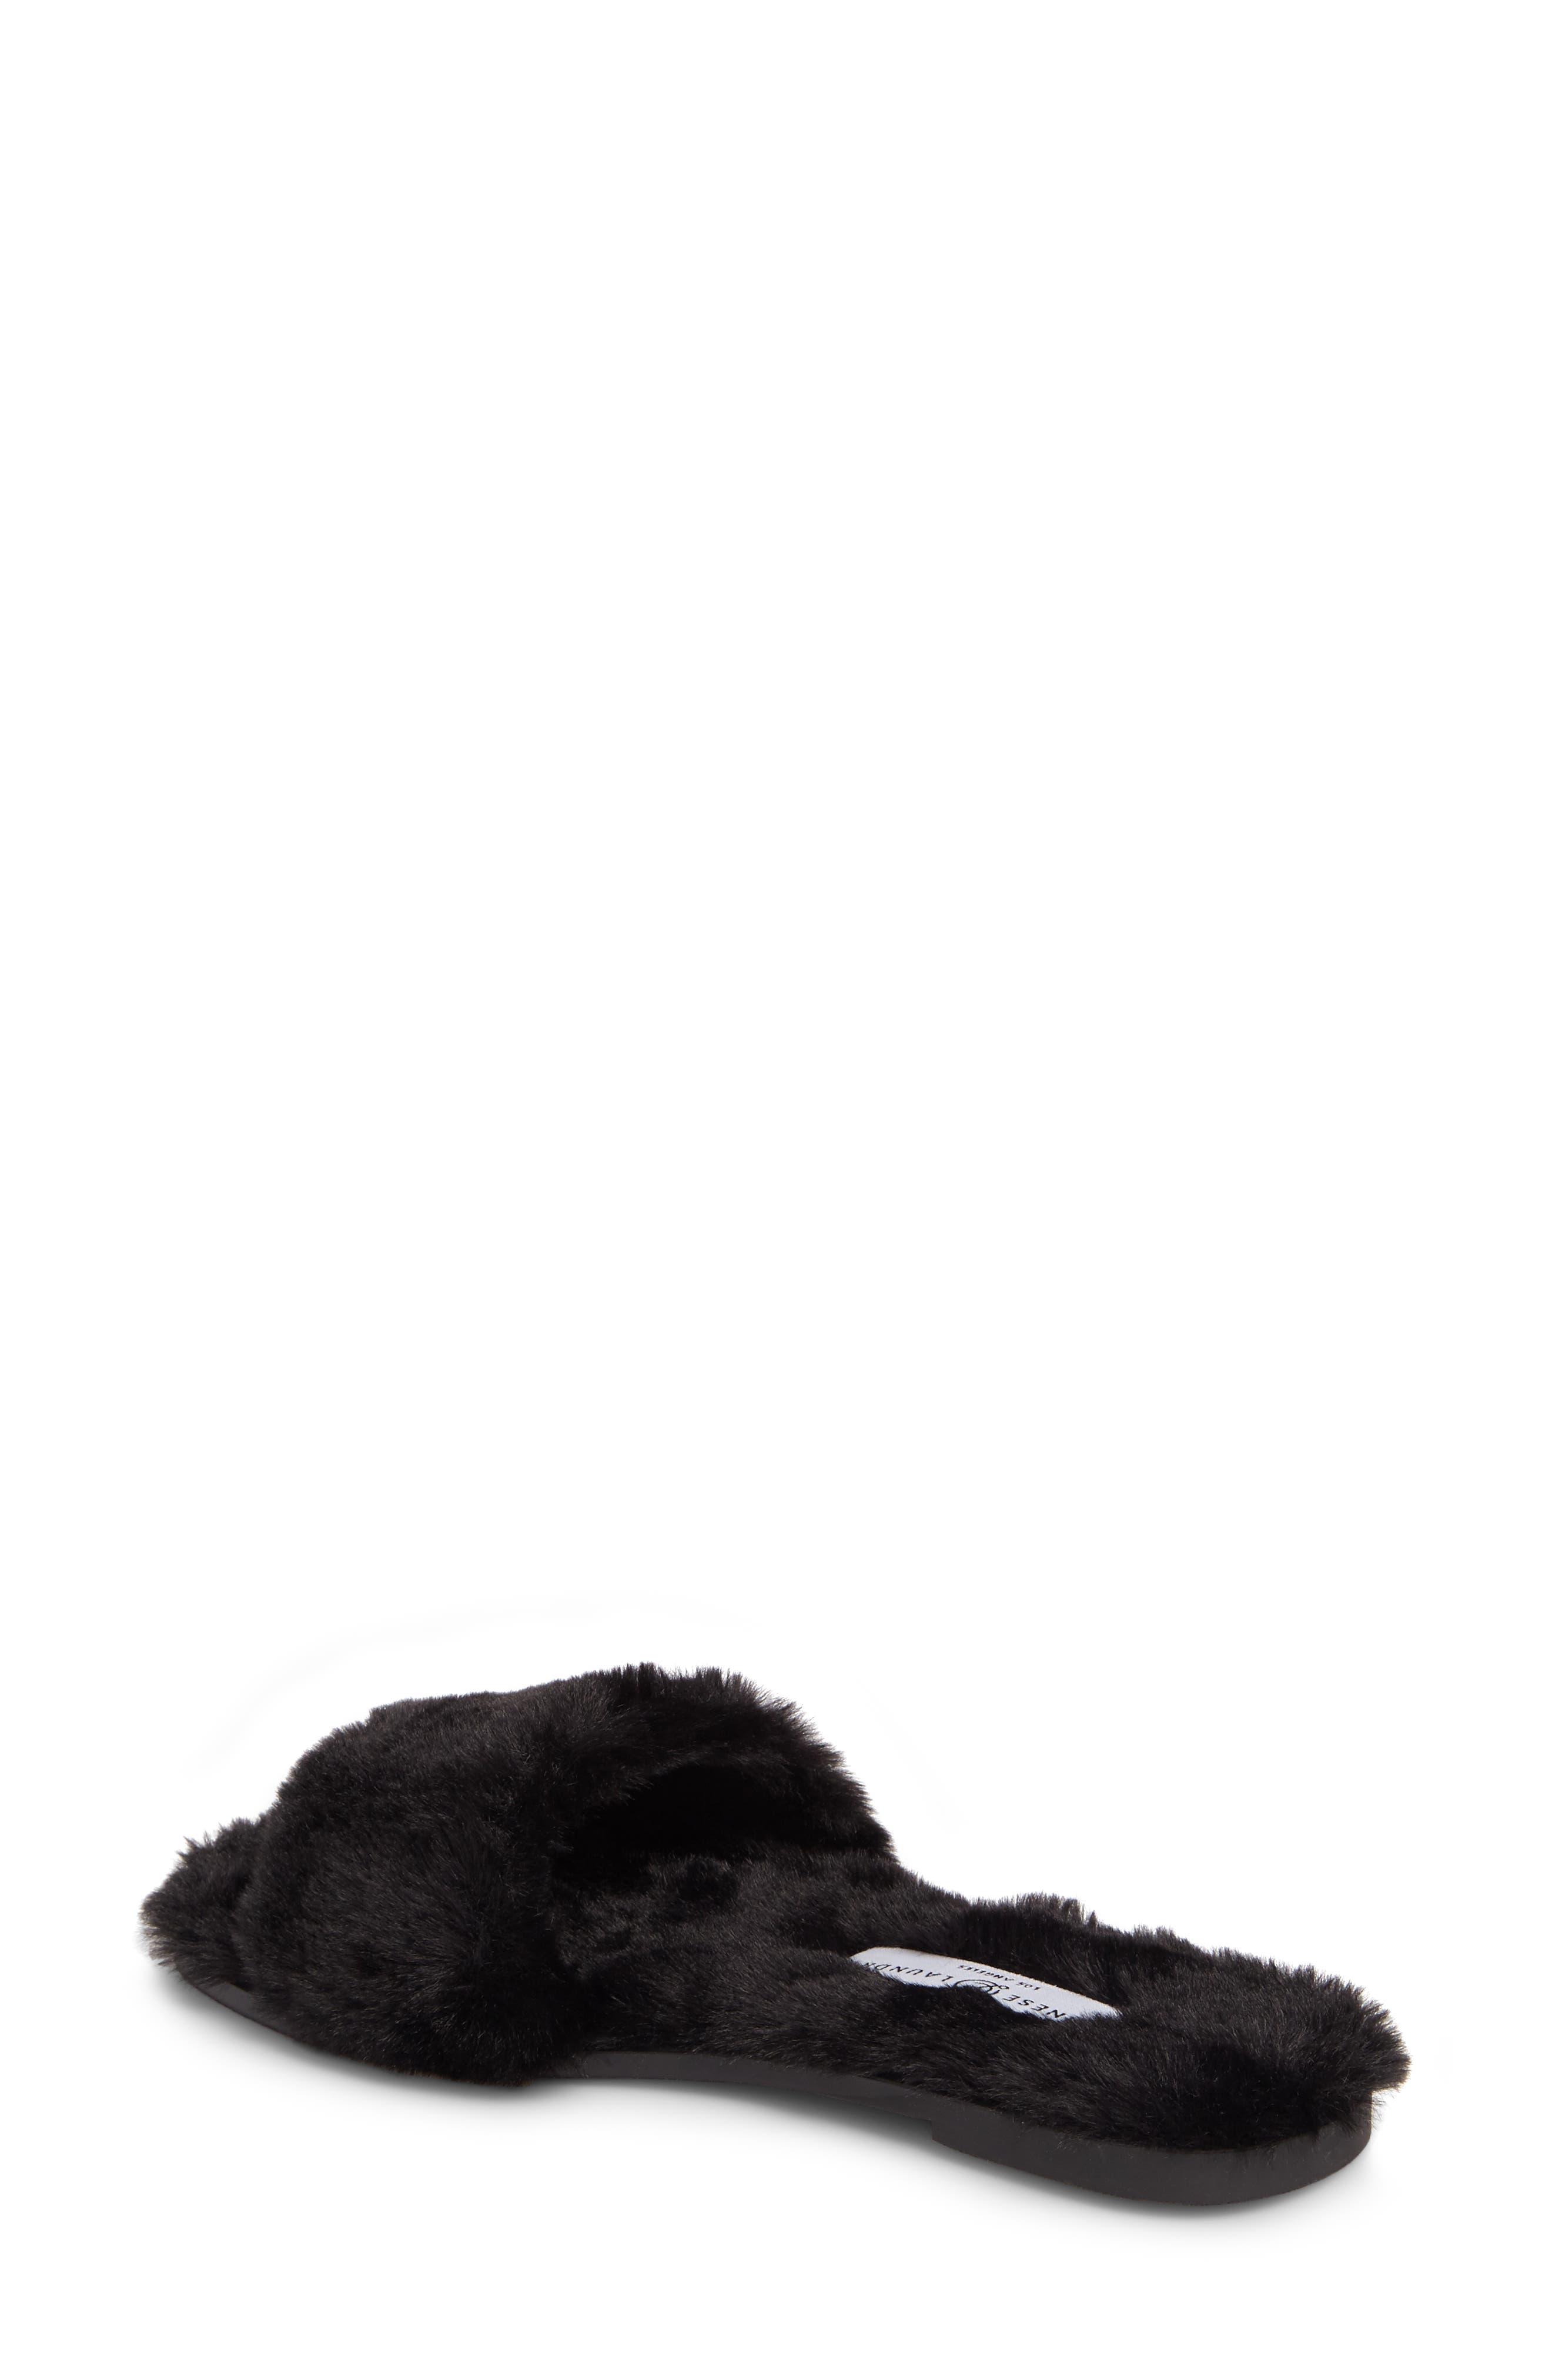 Mulholland Faux Fur Slide Sandal,                             Alternate thumbnail 2, color,                             001